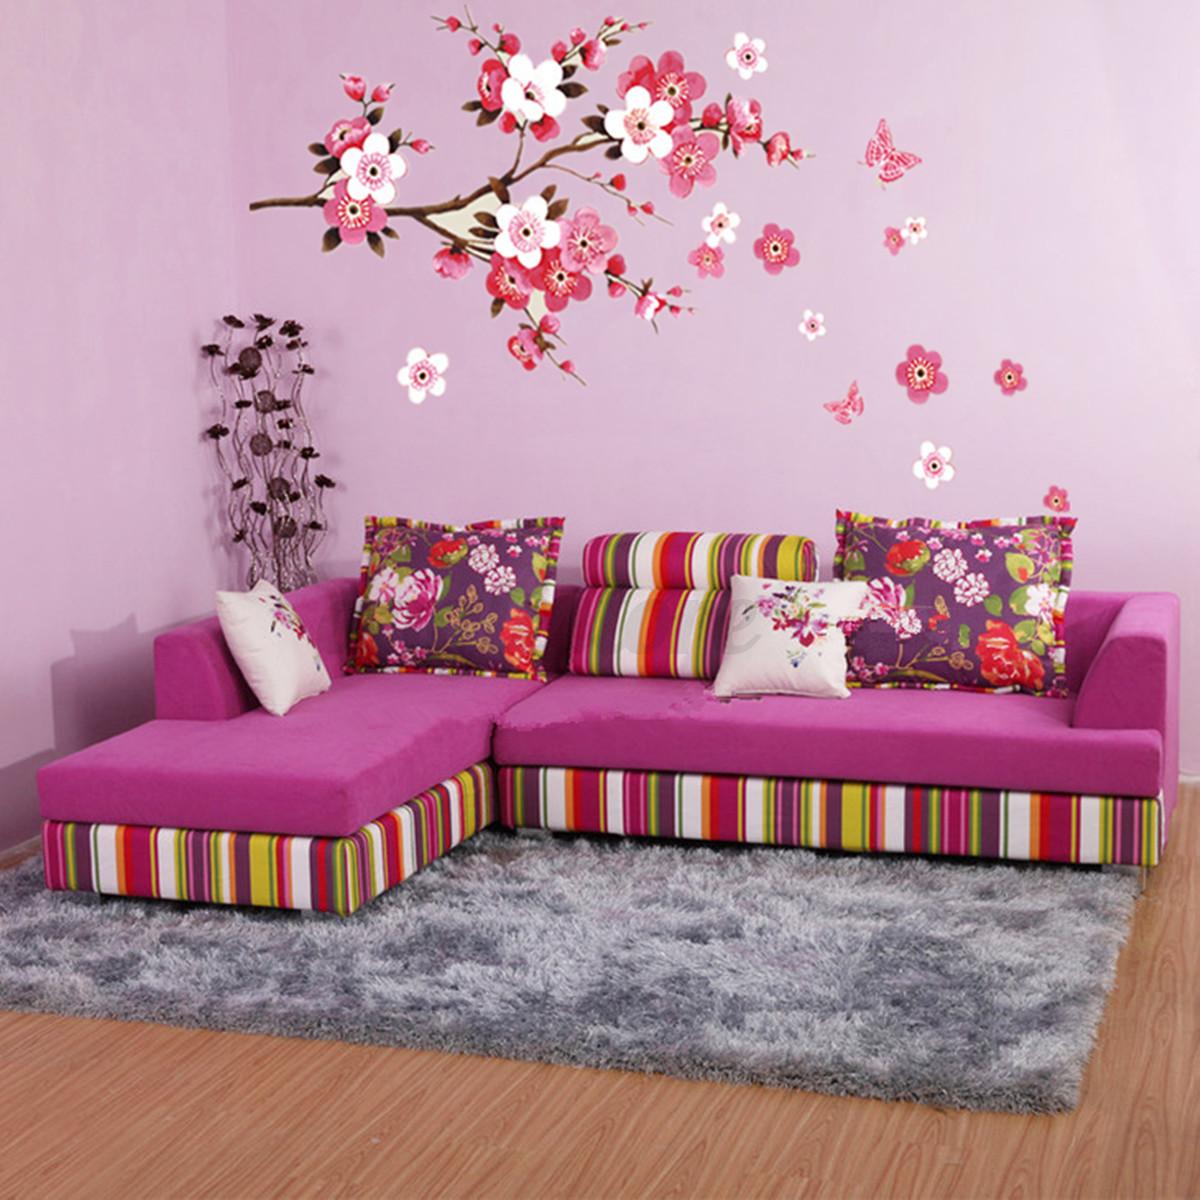 Large Sakura Flower Removable Wall Sticker Paper Mural  Part 42